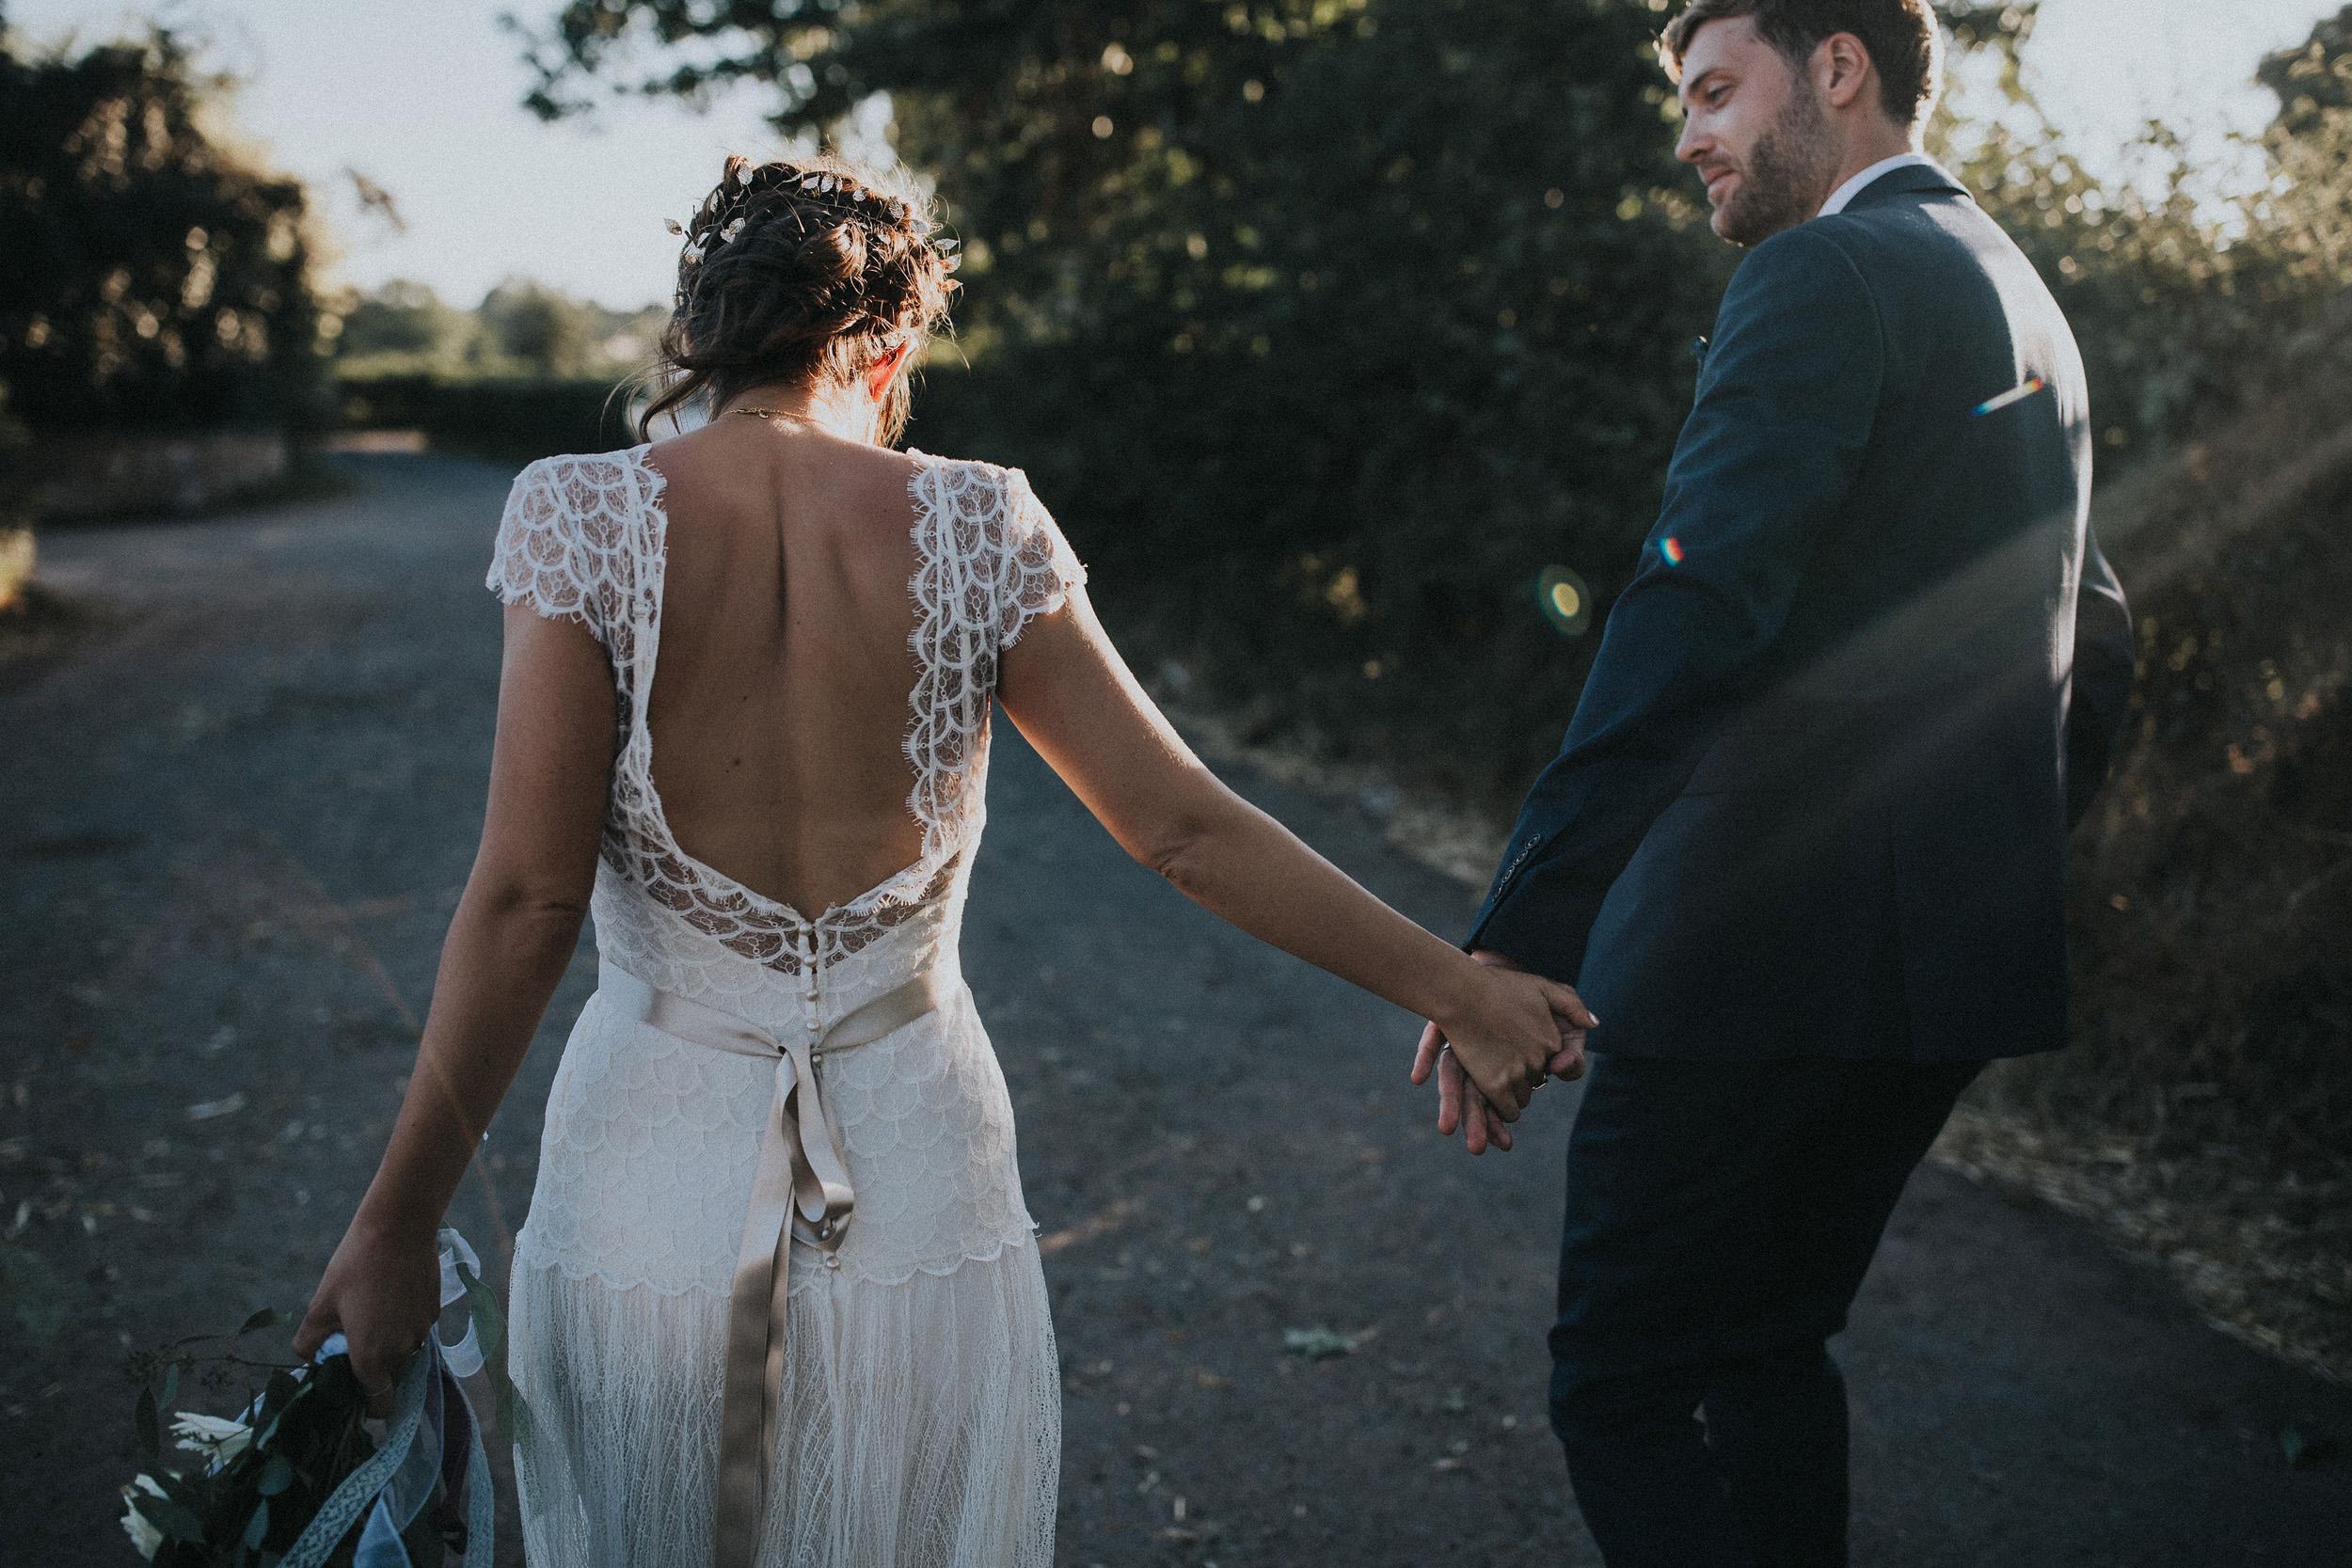 Martha-Laid-Back-Garden-Wedding-Lace-Wedding-Dress-Bohemian-Kate-Beaumont-54.jpg